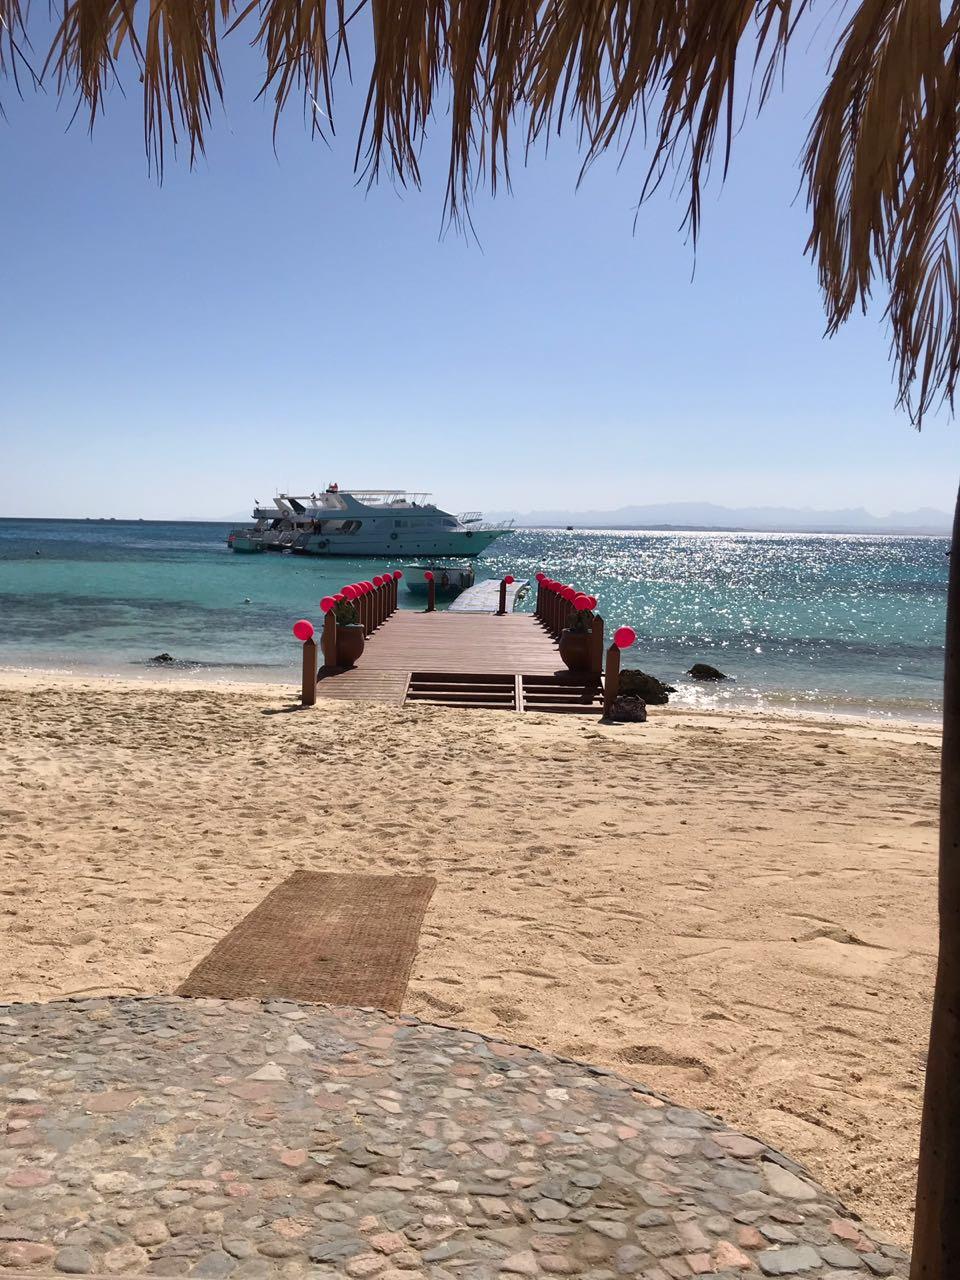 Schnorchelausflug zur Utopia Insel ab Soma Bay/Safaga